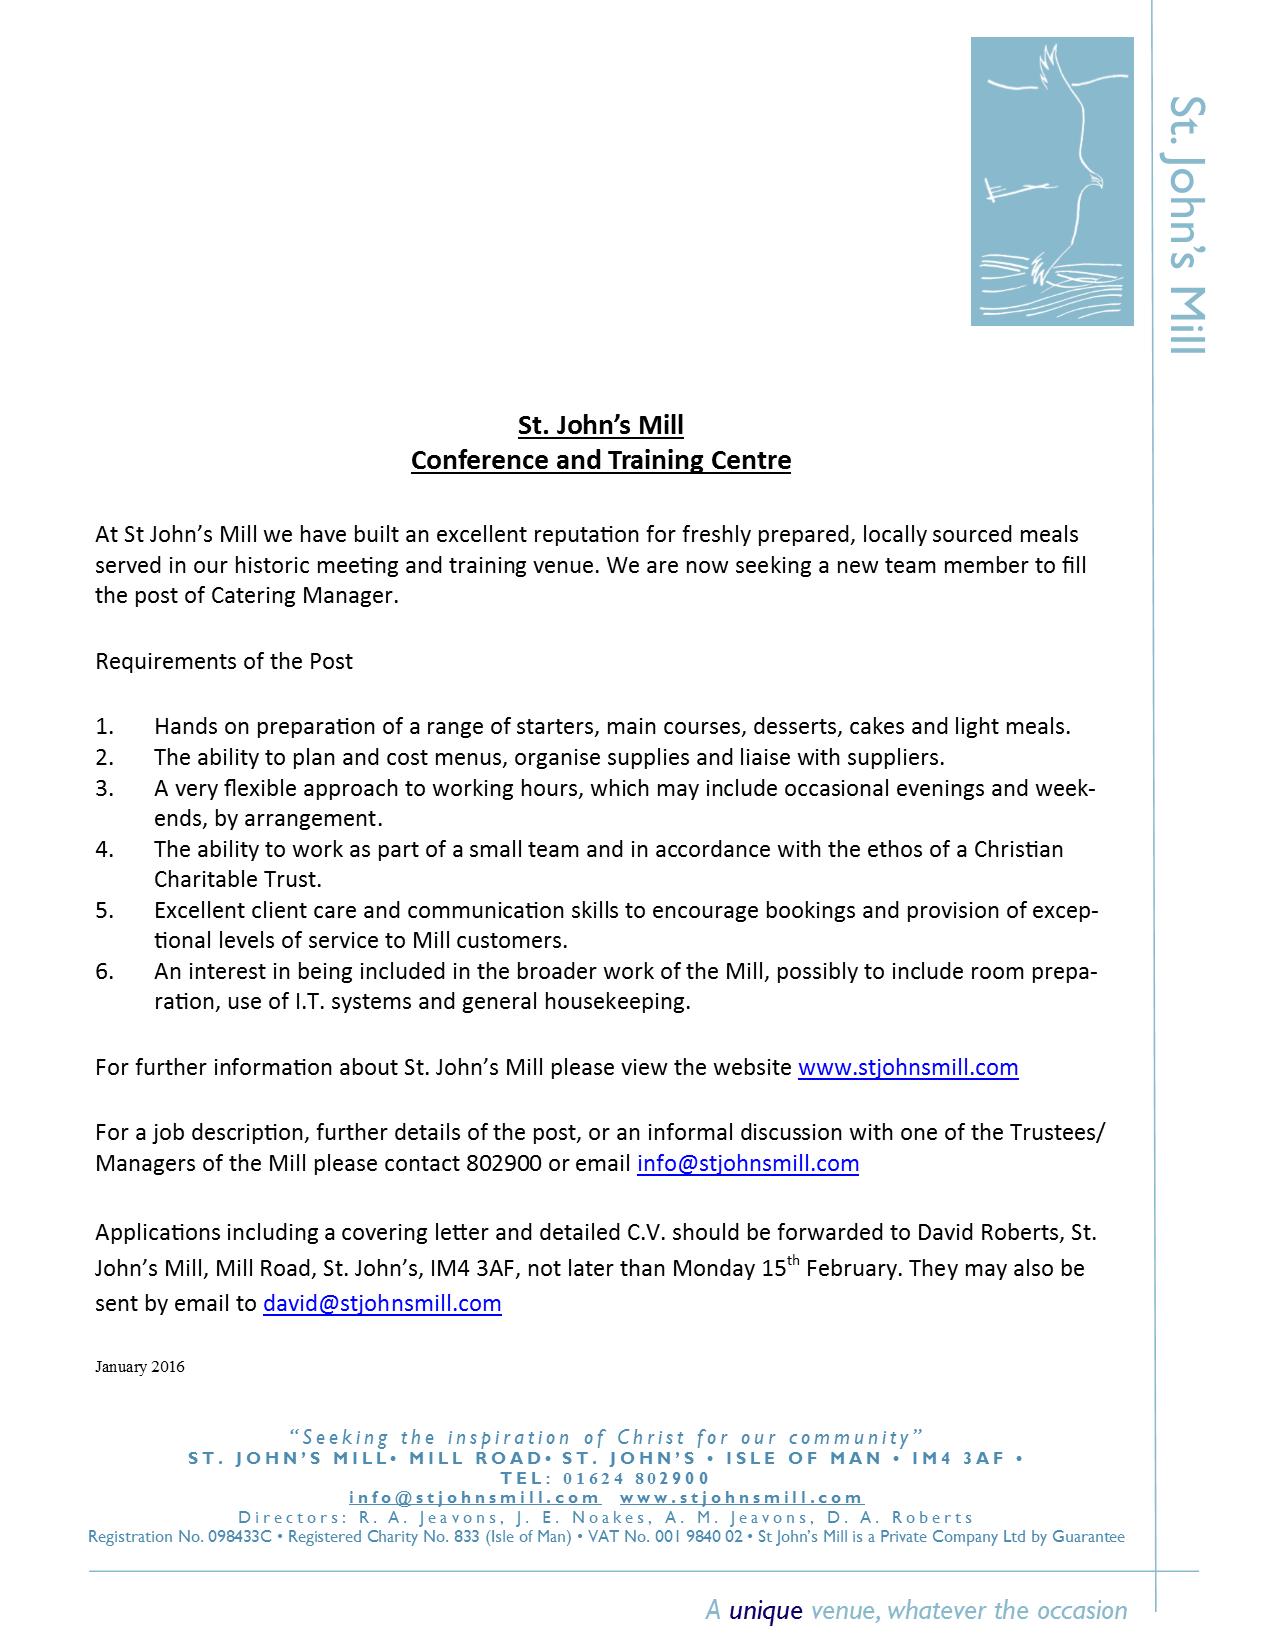 St. John's Mill - Job Vacancy